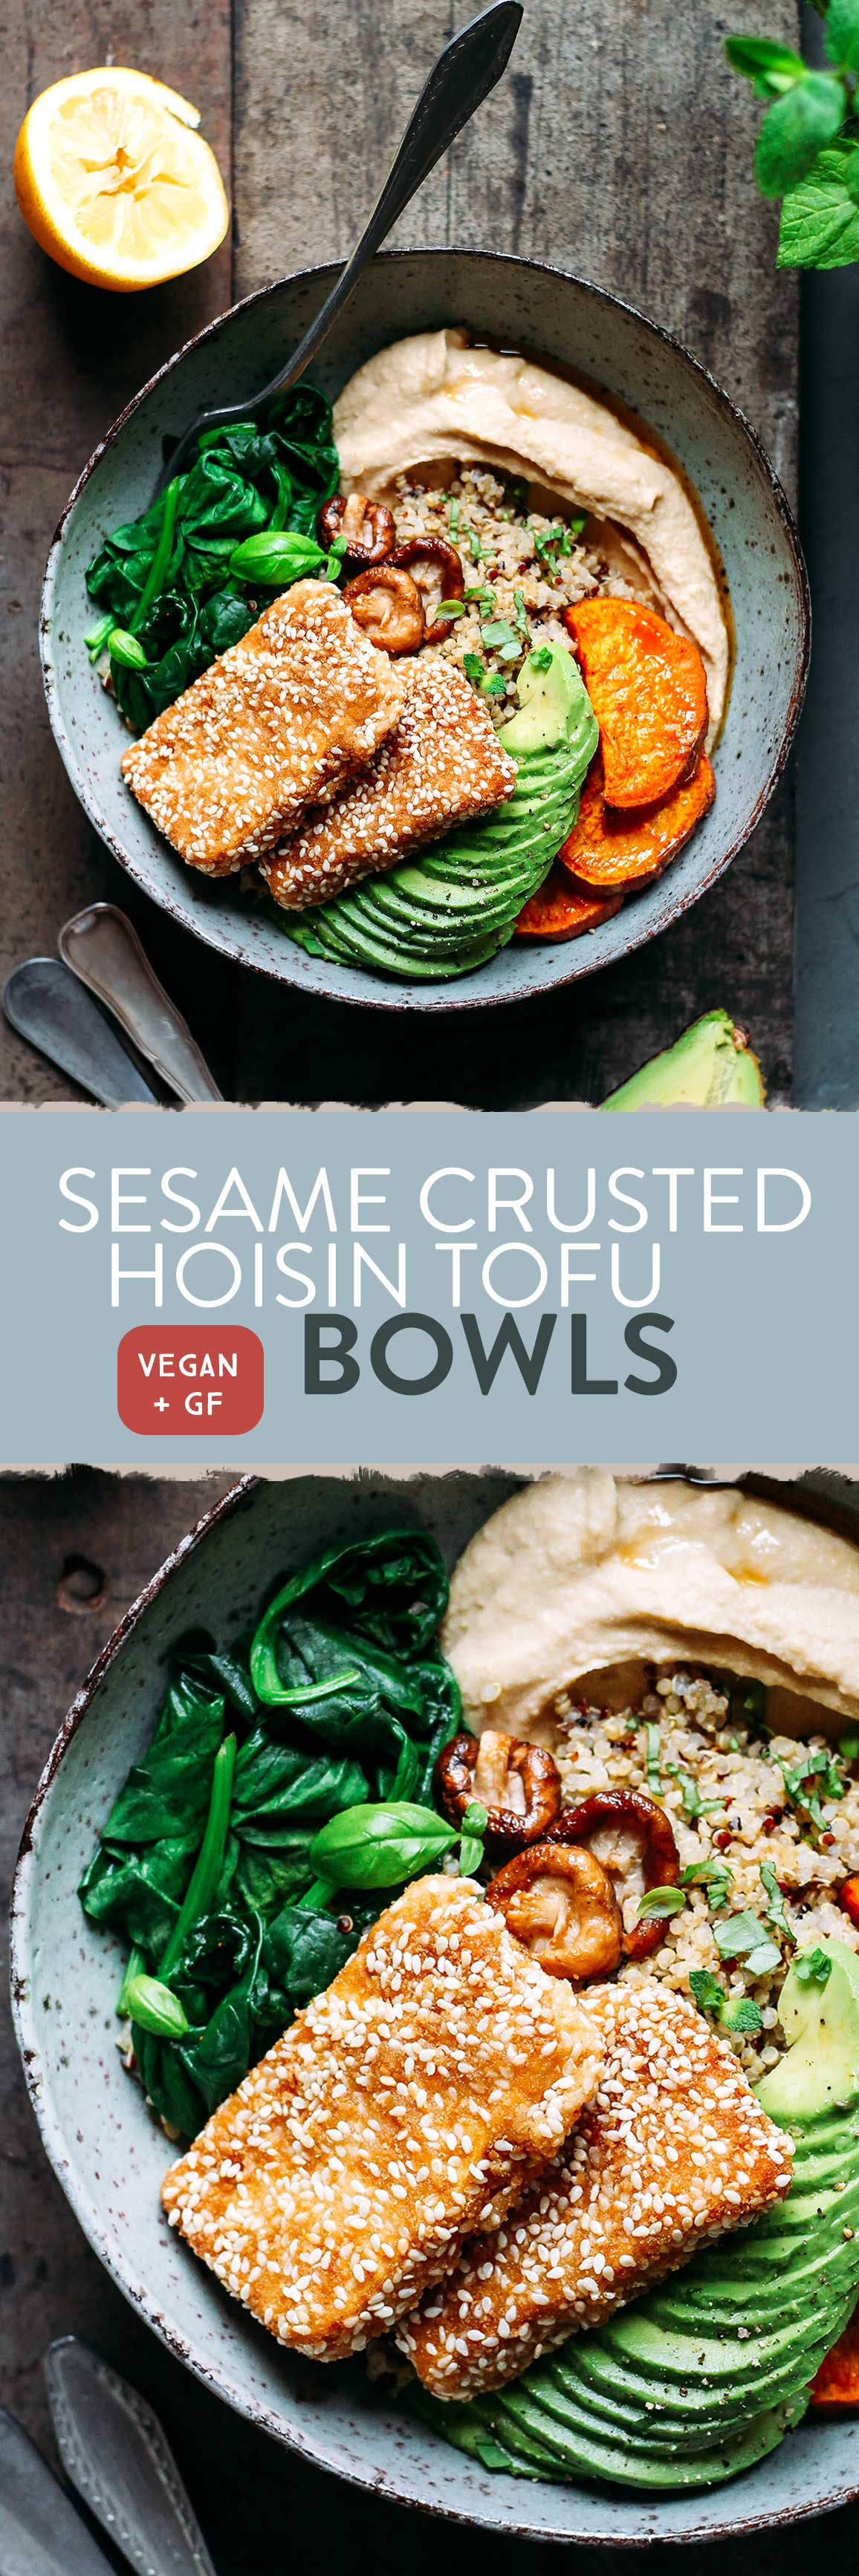 Sesame Crusted Hoisin Tofu Bowls